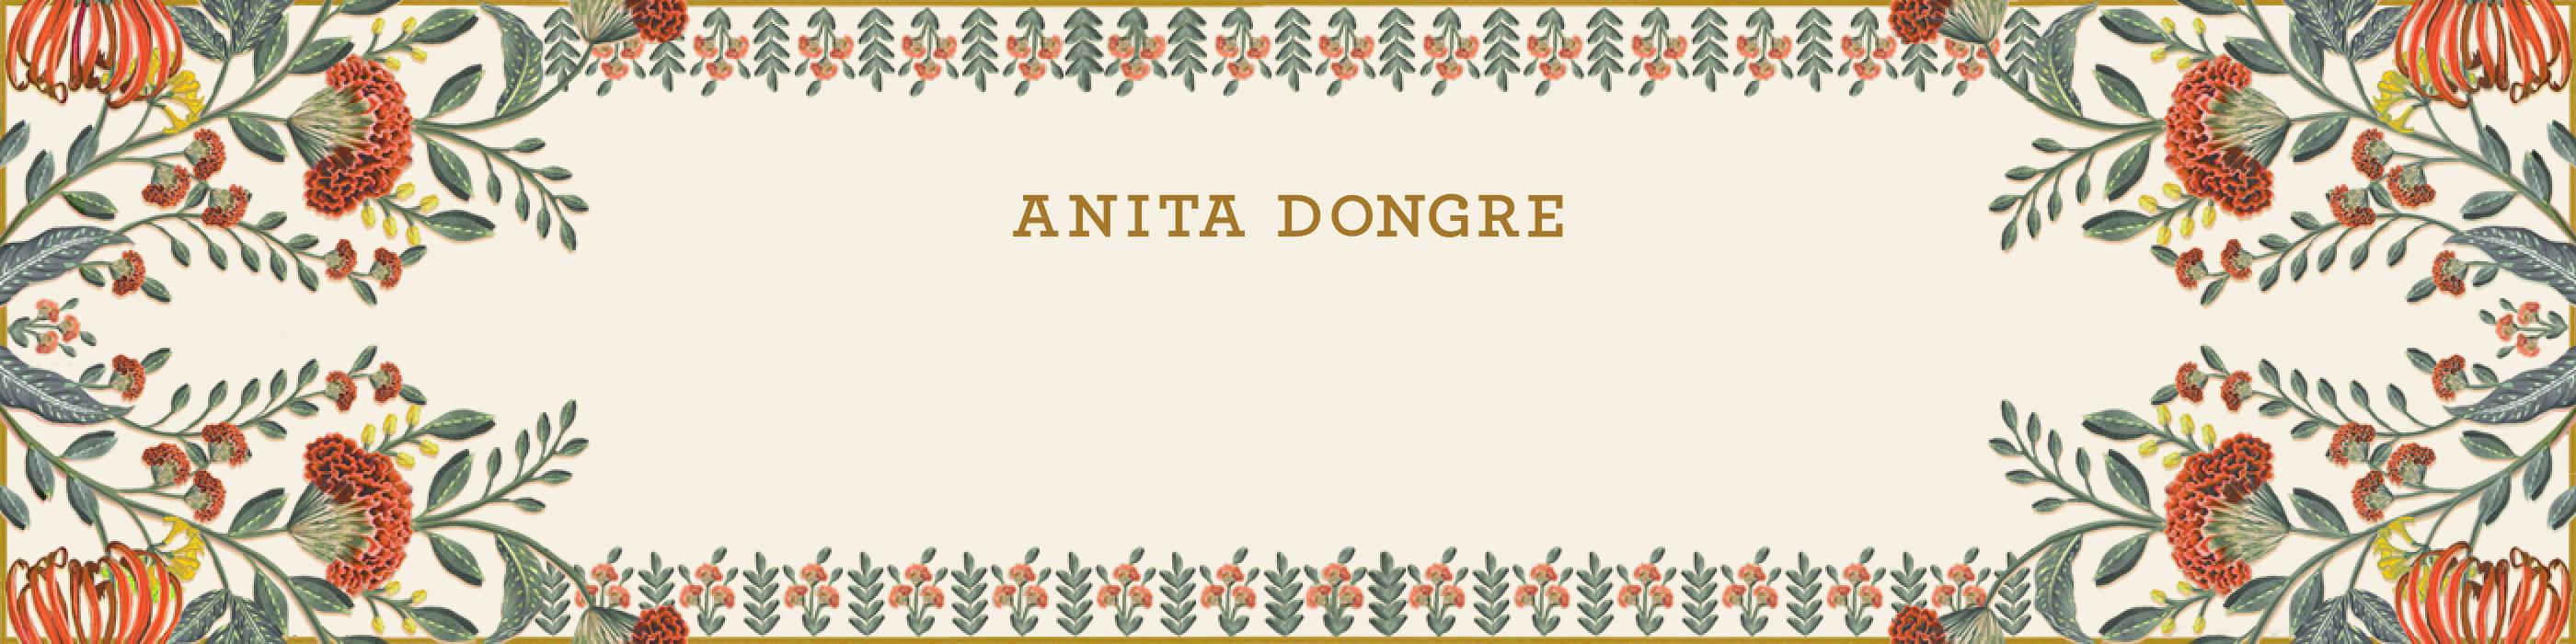 Anita Dongre - Online